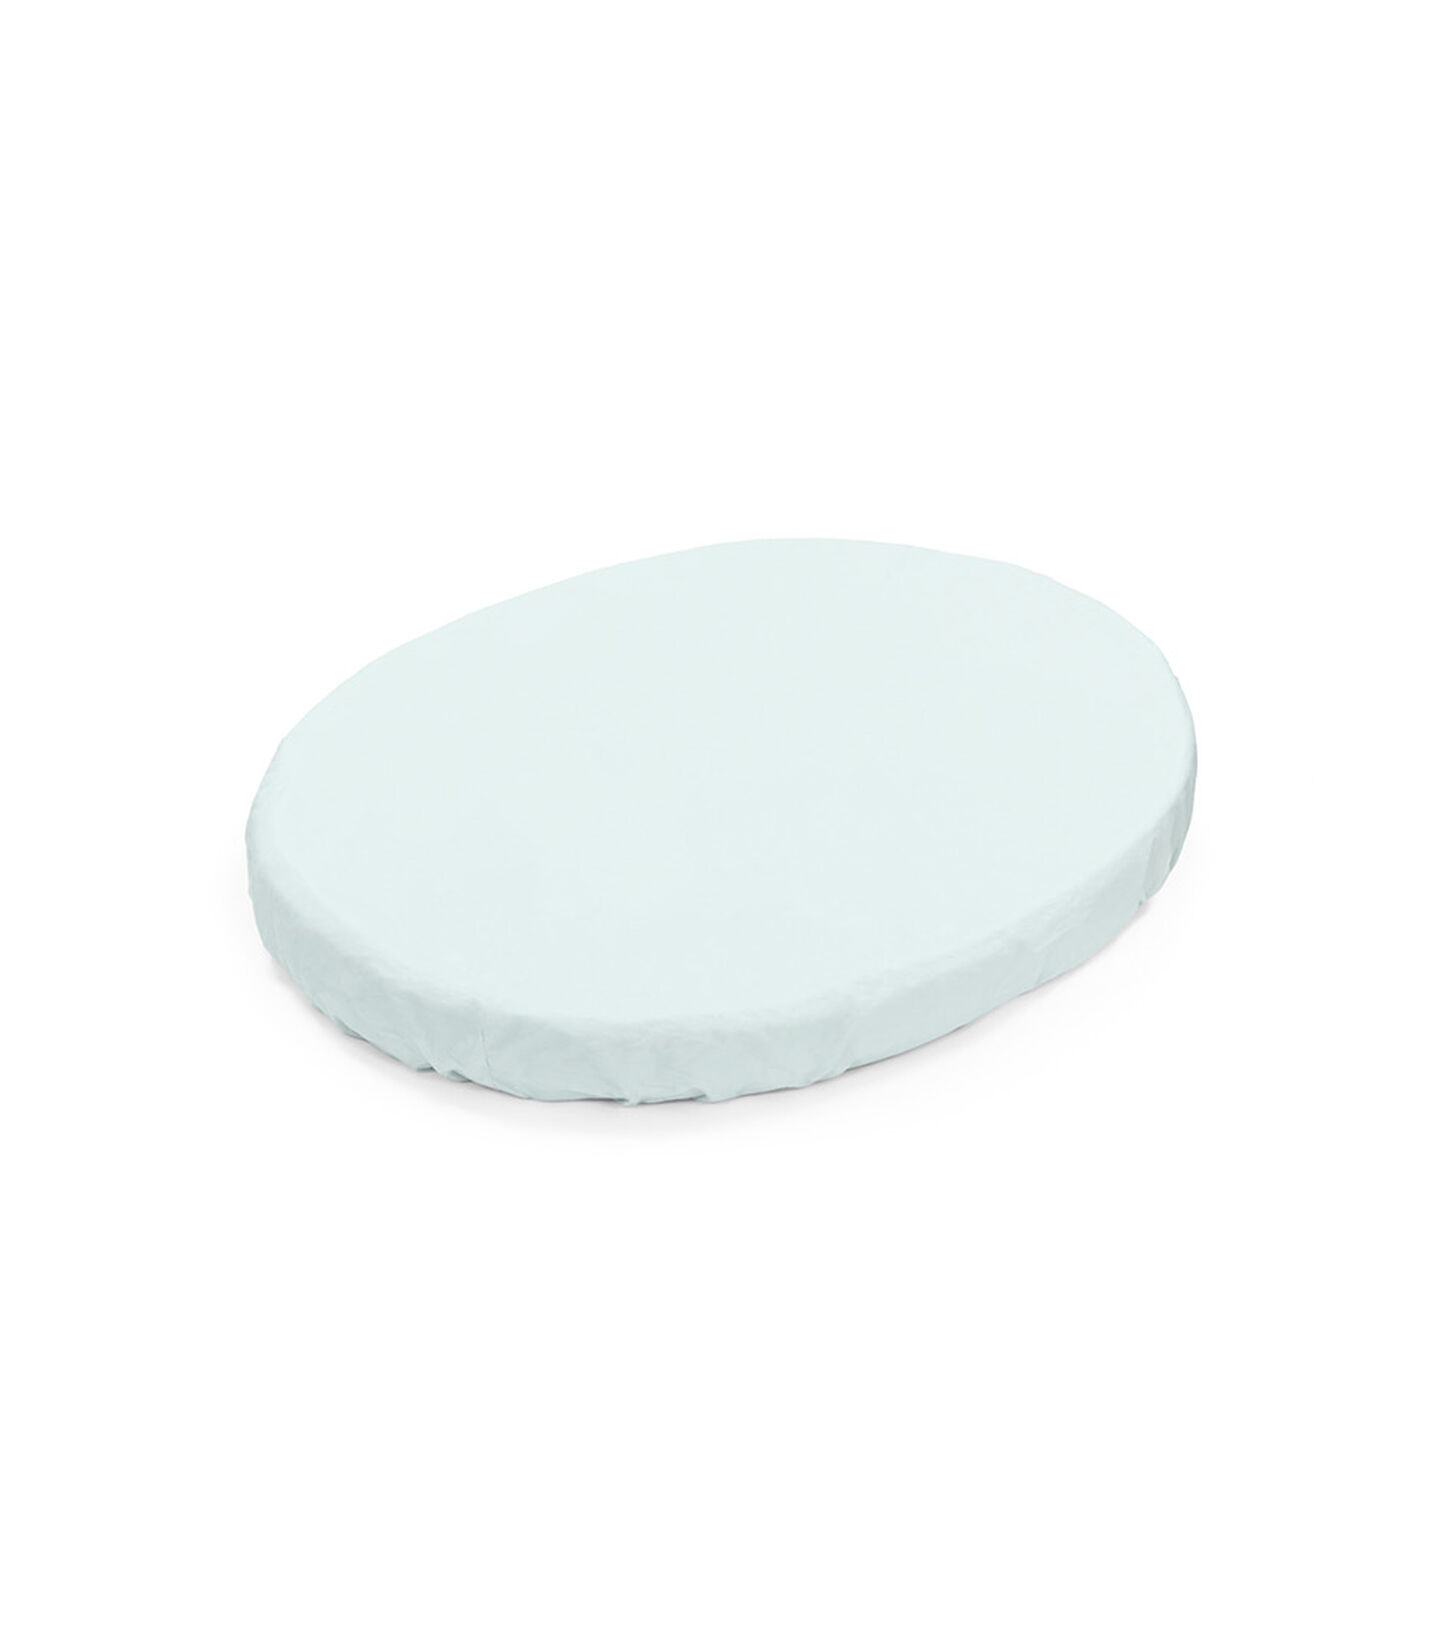 Mini sábana bajera ajustable Stokke® Sleepi™ azul polvo, Azul polvo, mainview view 2